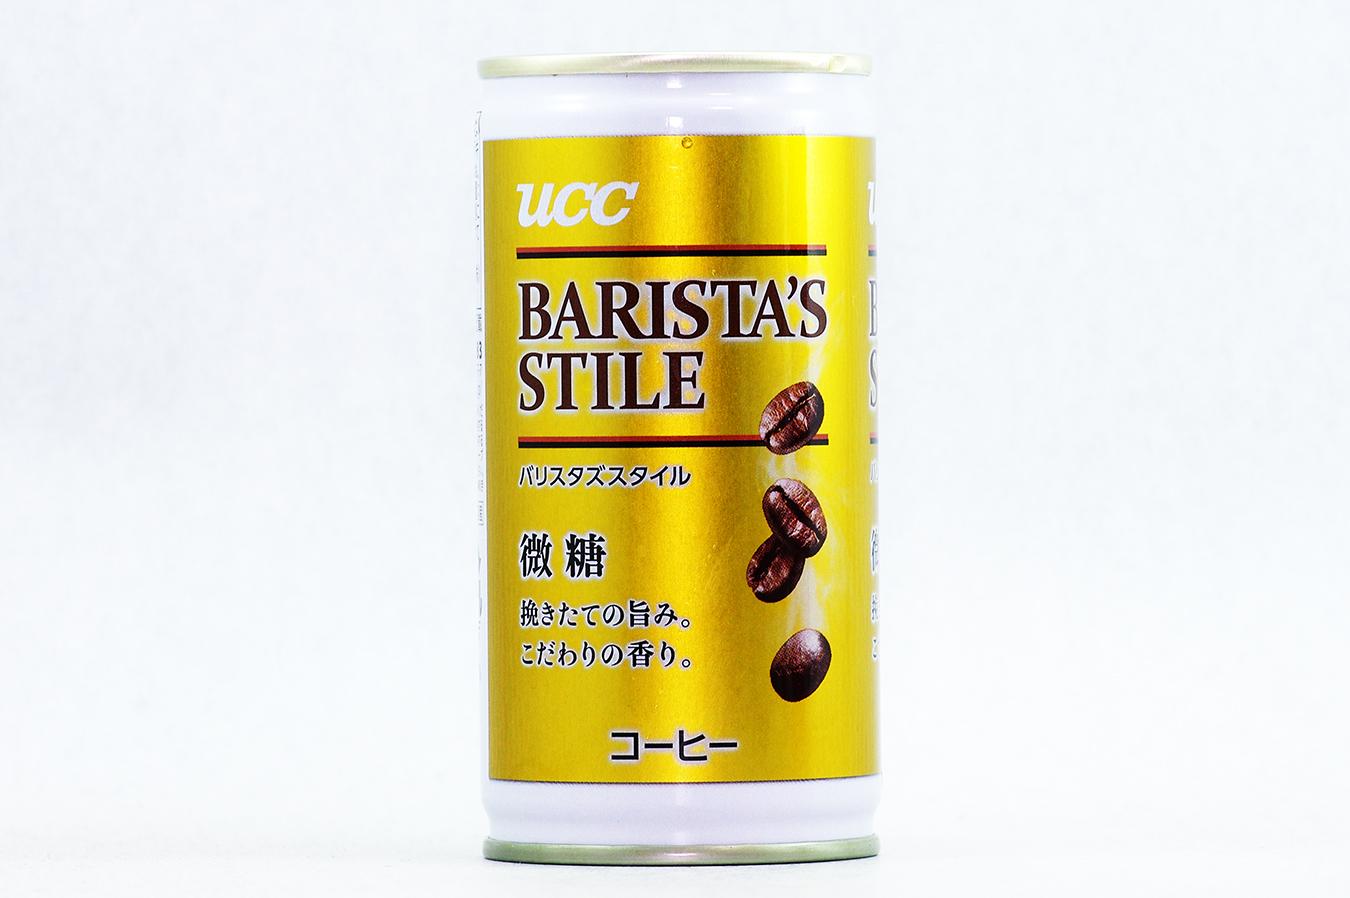 UCC BARISTA'S STILE 微糖 2017年11月